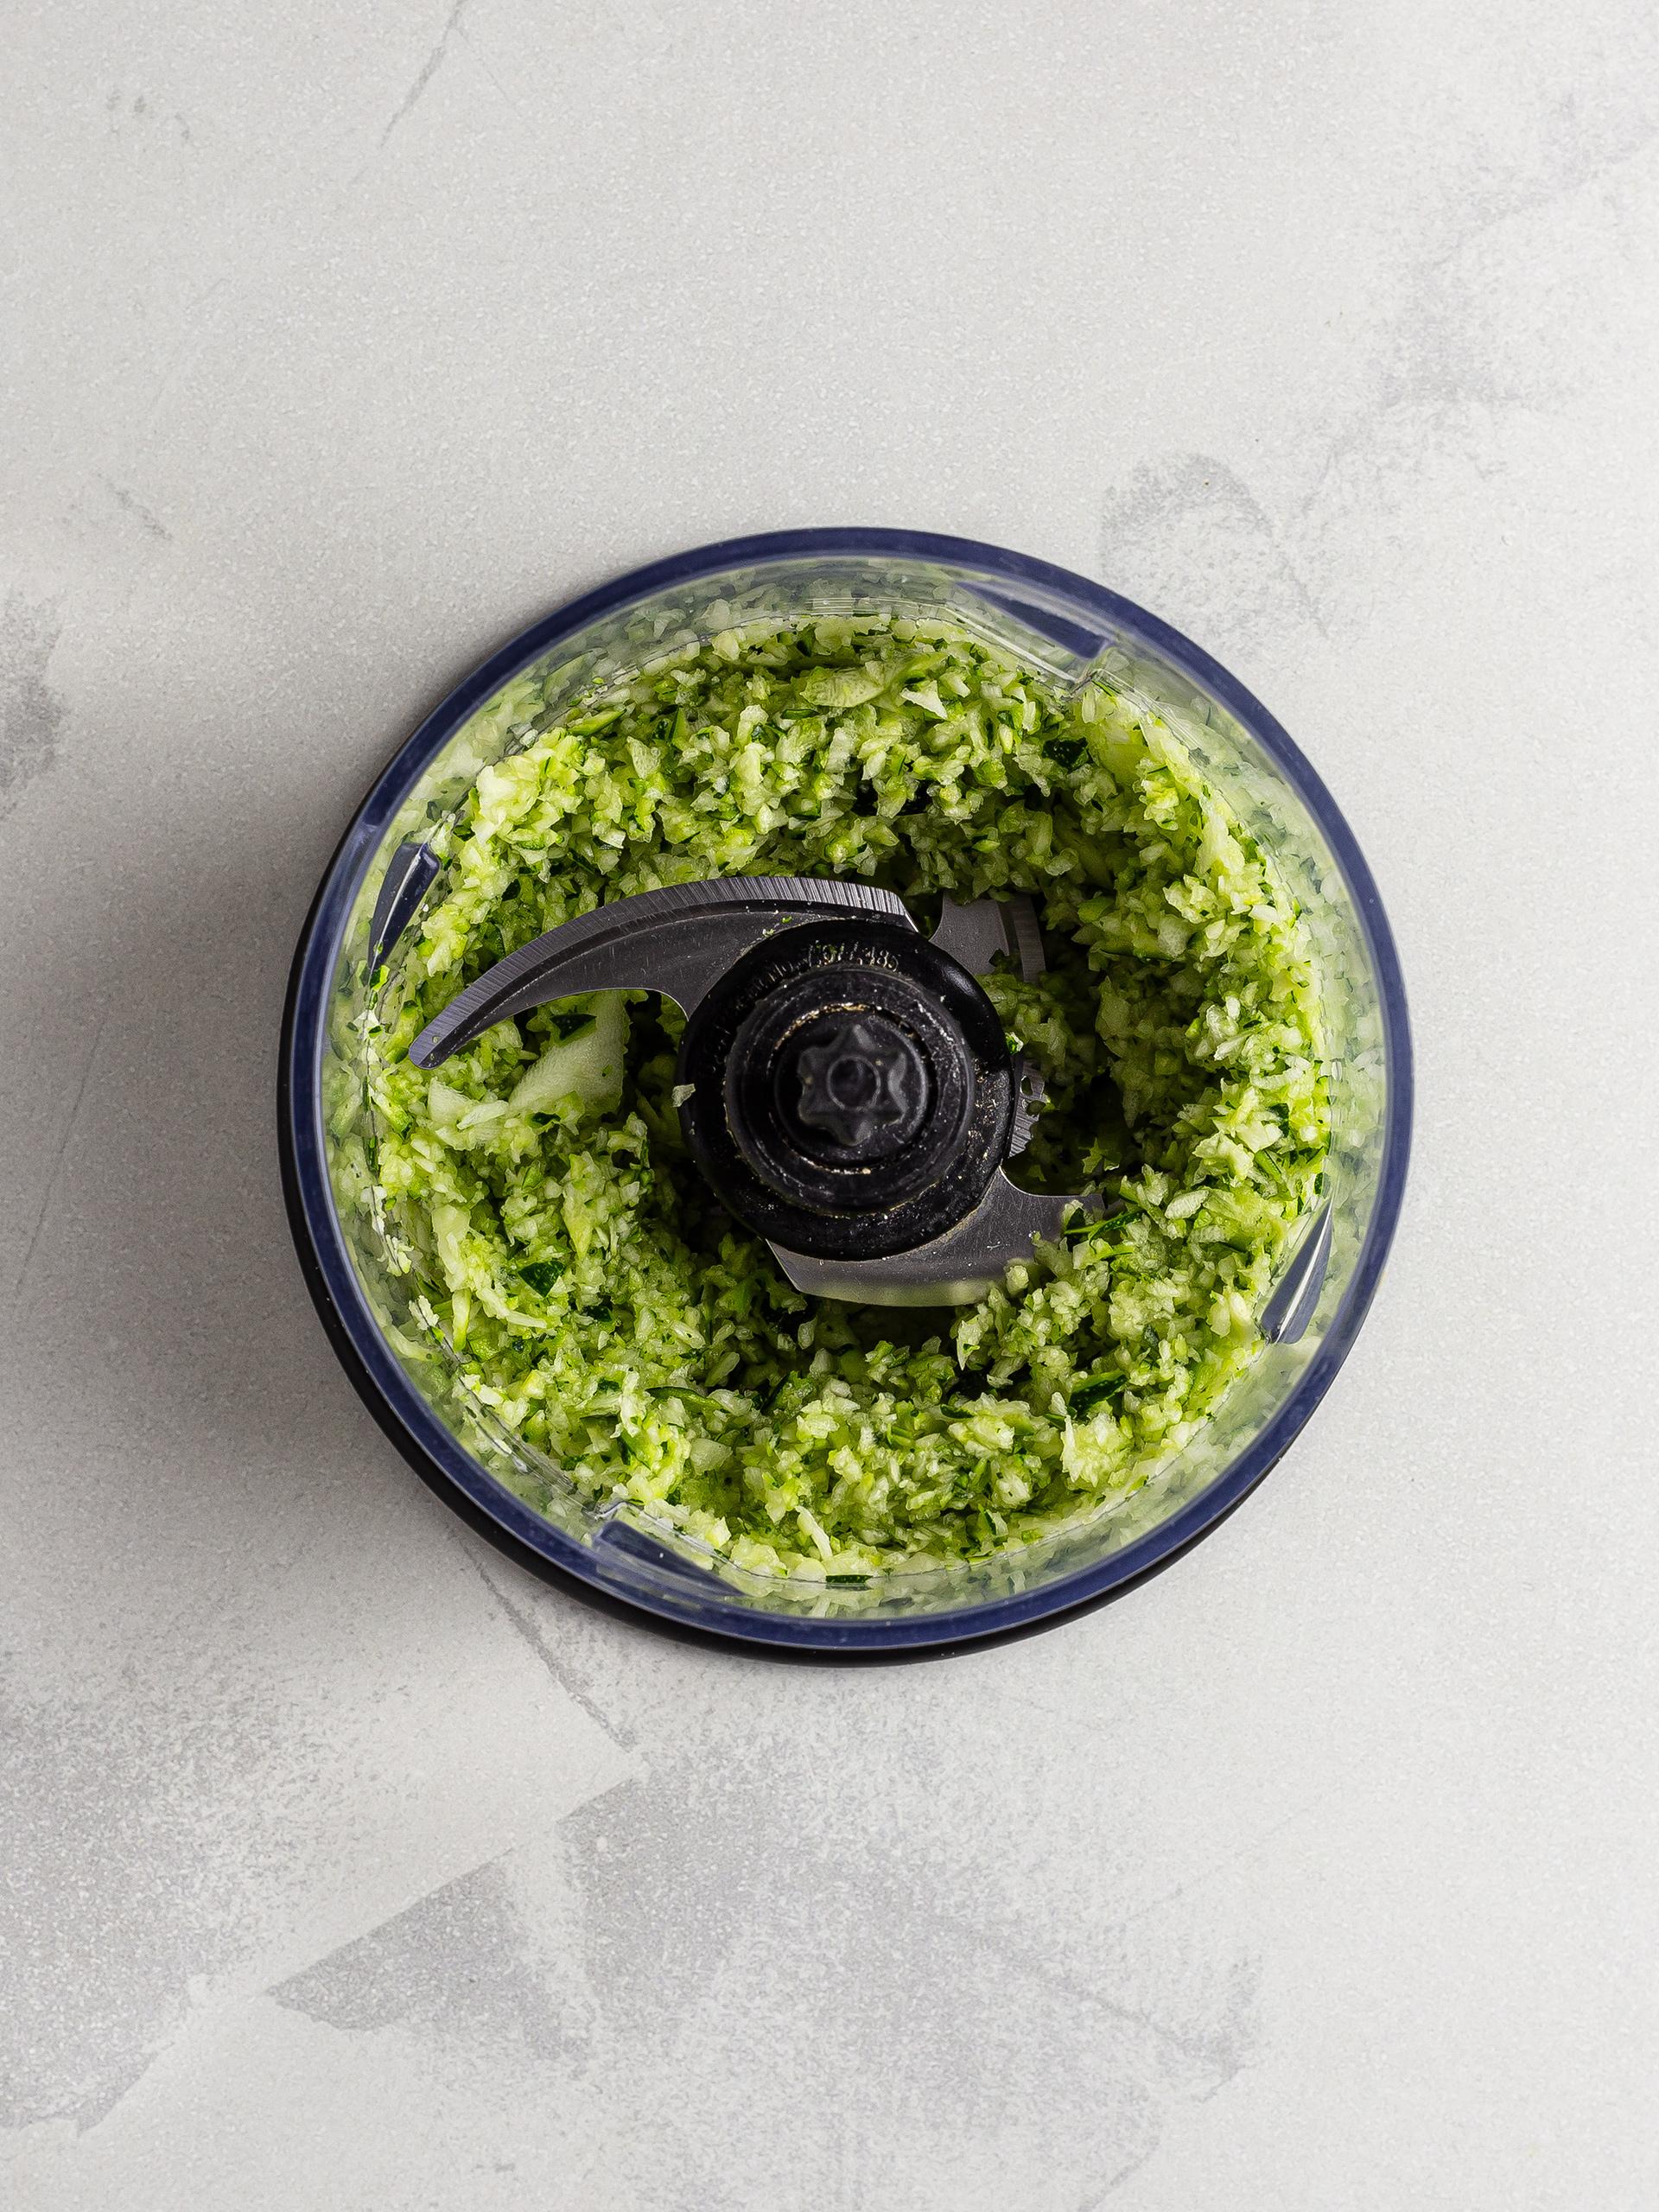 Grated zucchini in a food processor